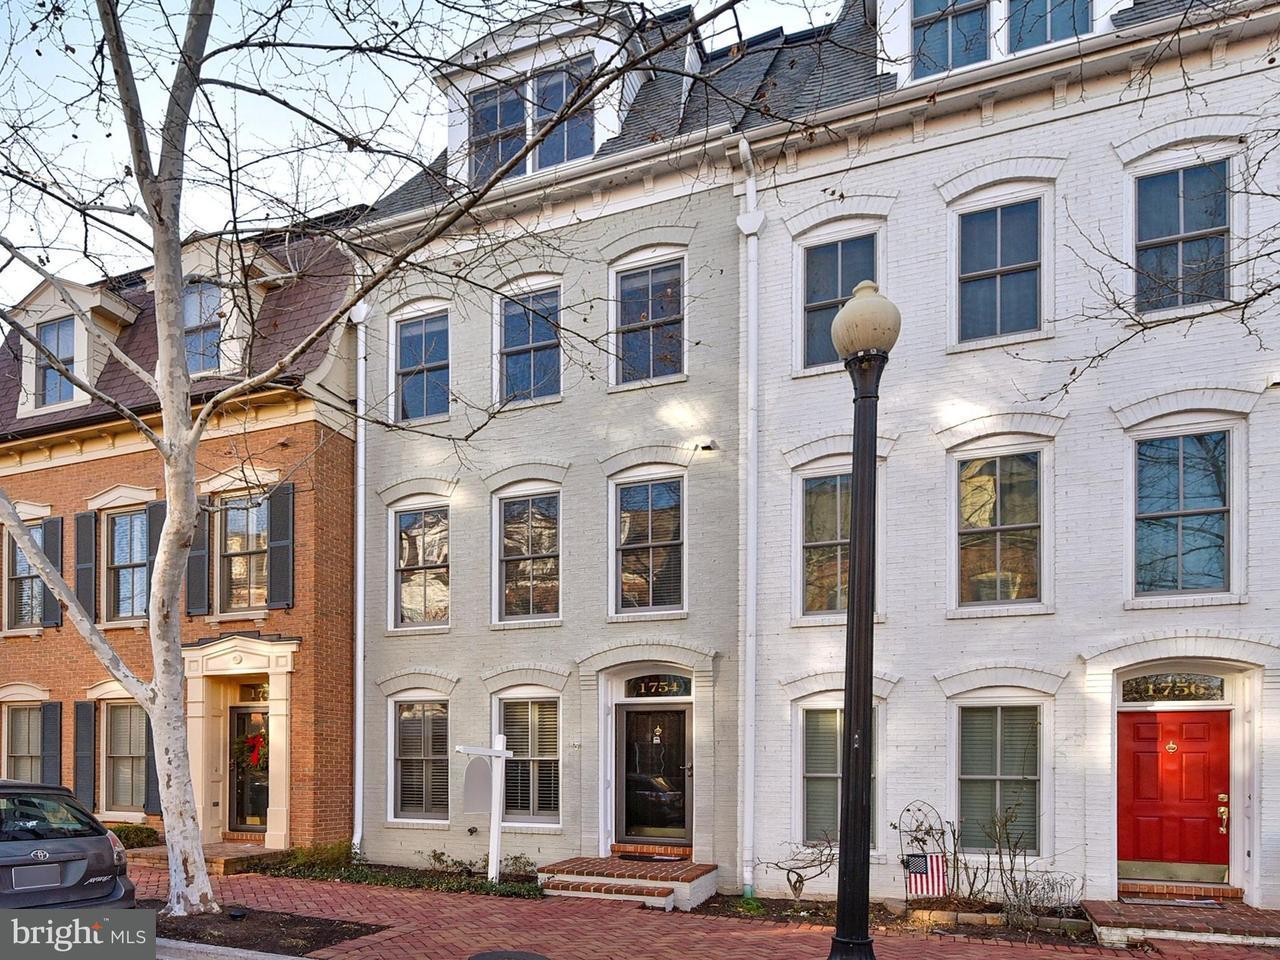 1754 potomac greens dr  alexandria  va mls 1004351007  homes for sale in old town alexandria va 22314